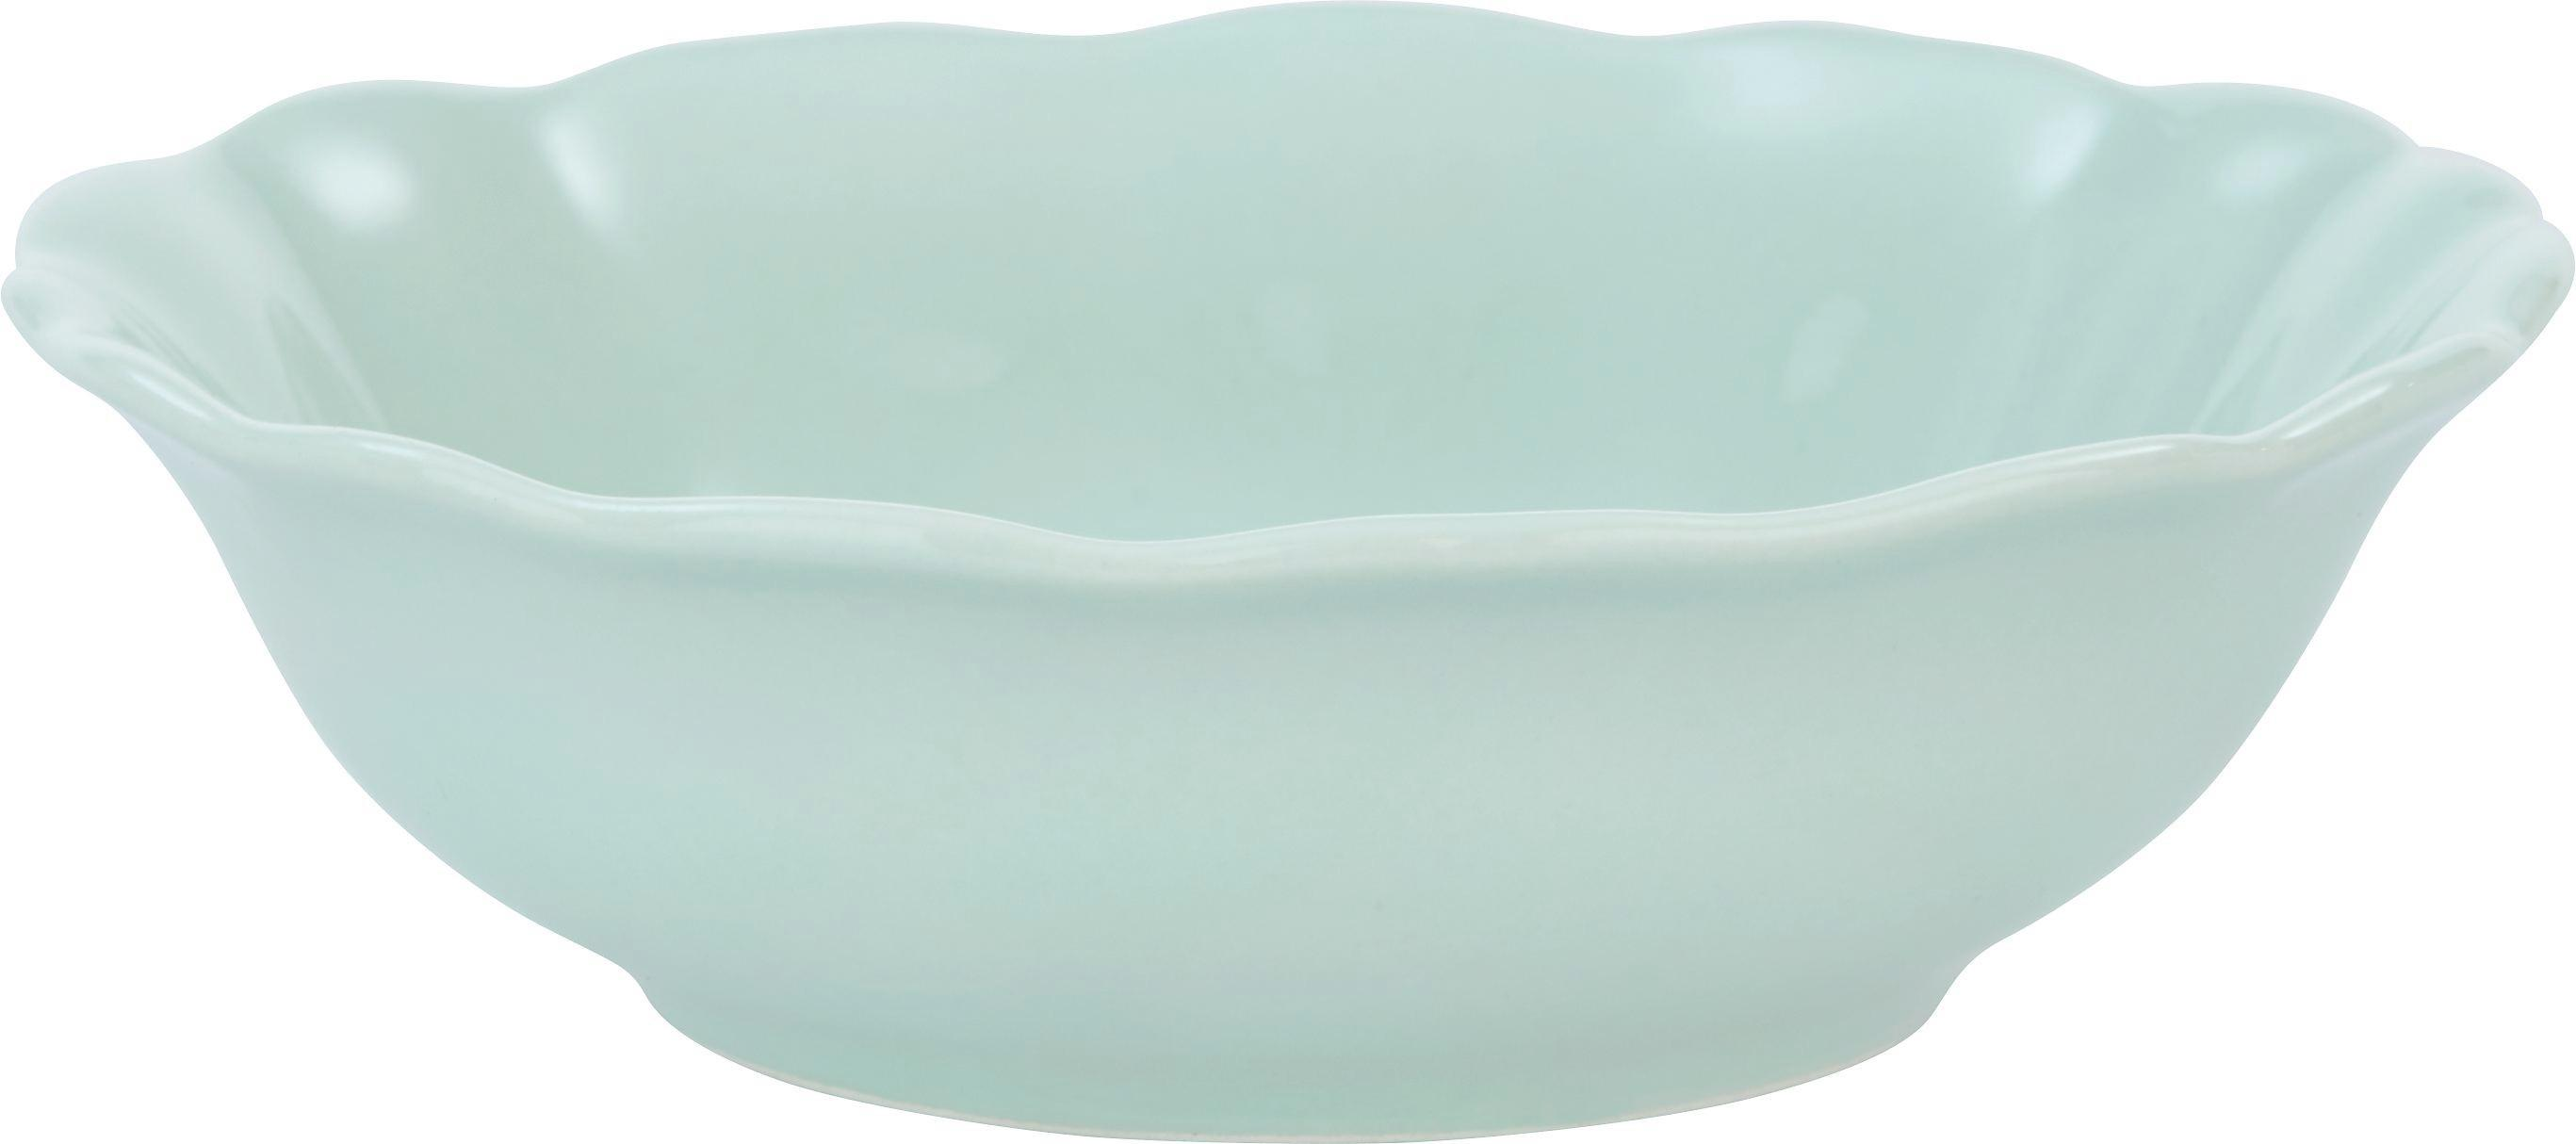 Schale Pauline in Mintgrün - Mintgrün, ROMANTIK / LANDHAUS, Keramik (15cm) - ZANDIARA